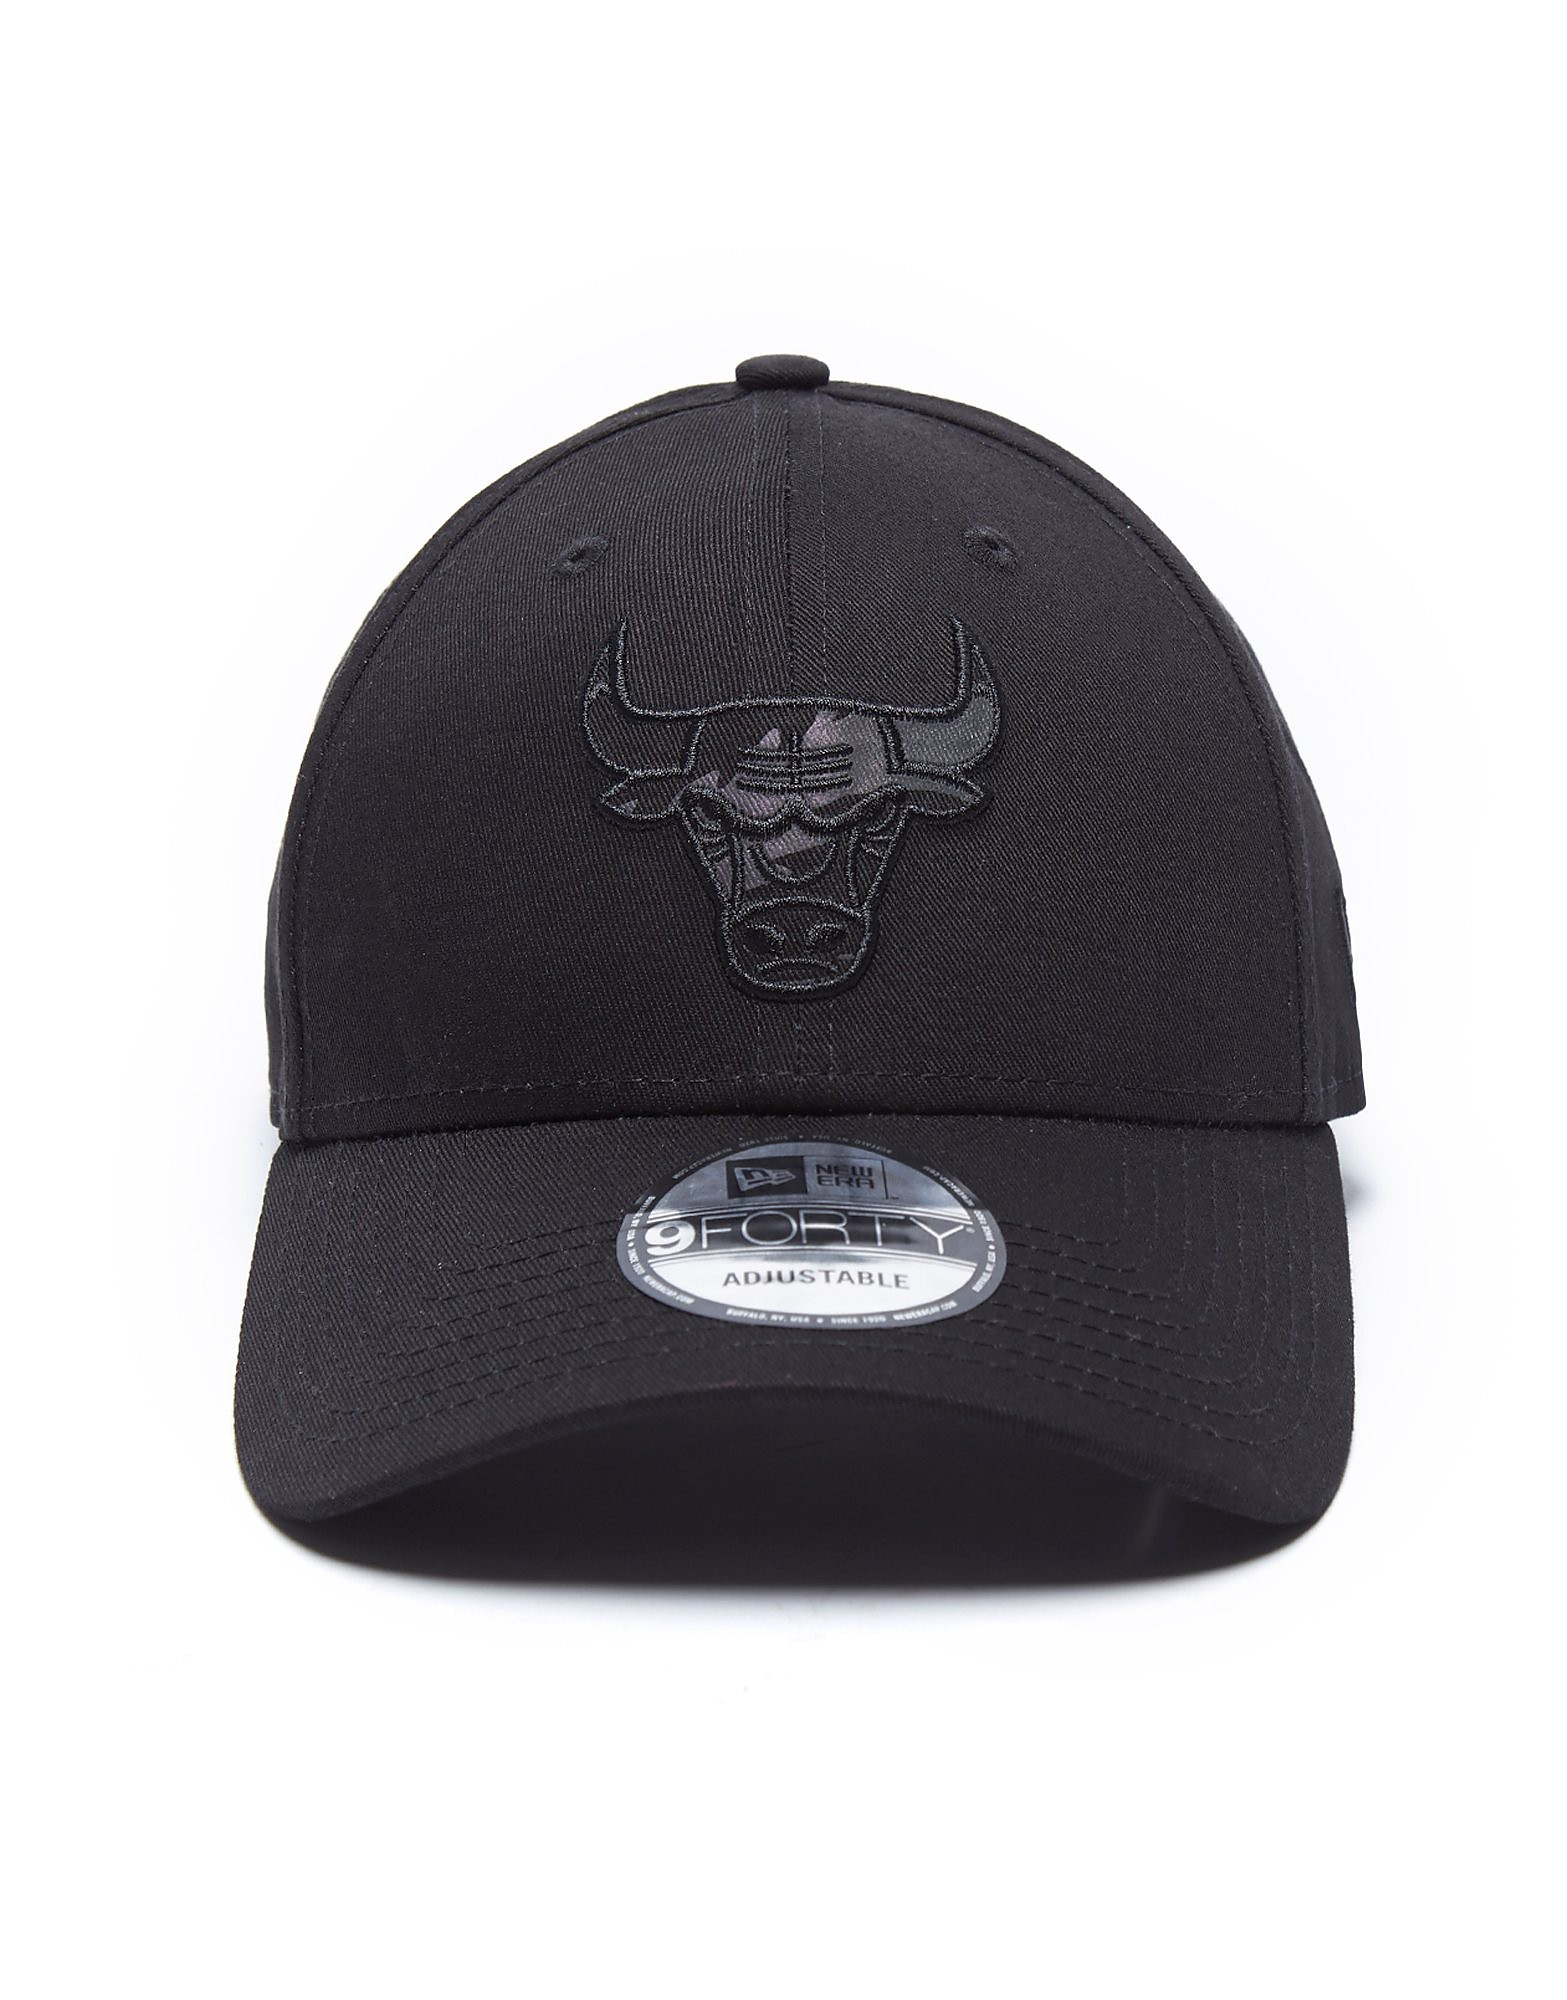 New Era NBA Chicago Bulls 9FORTY Cap